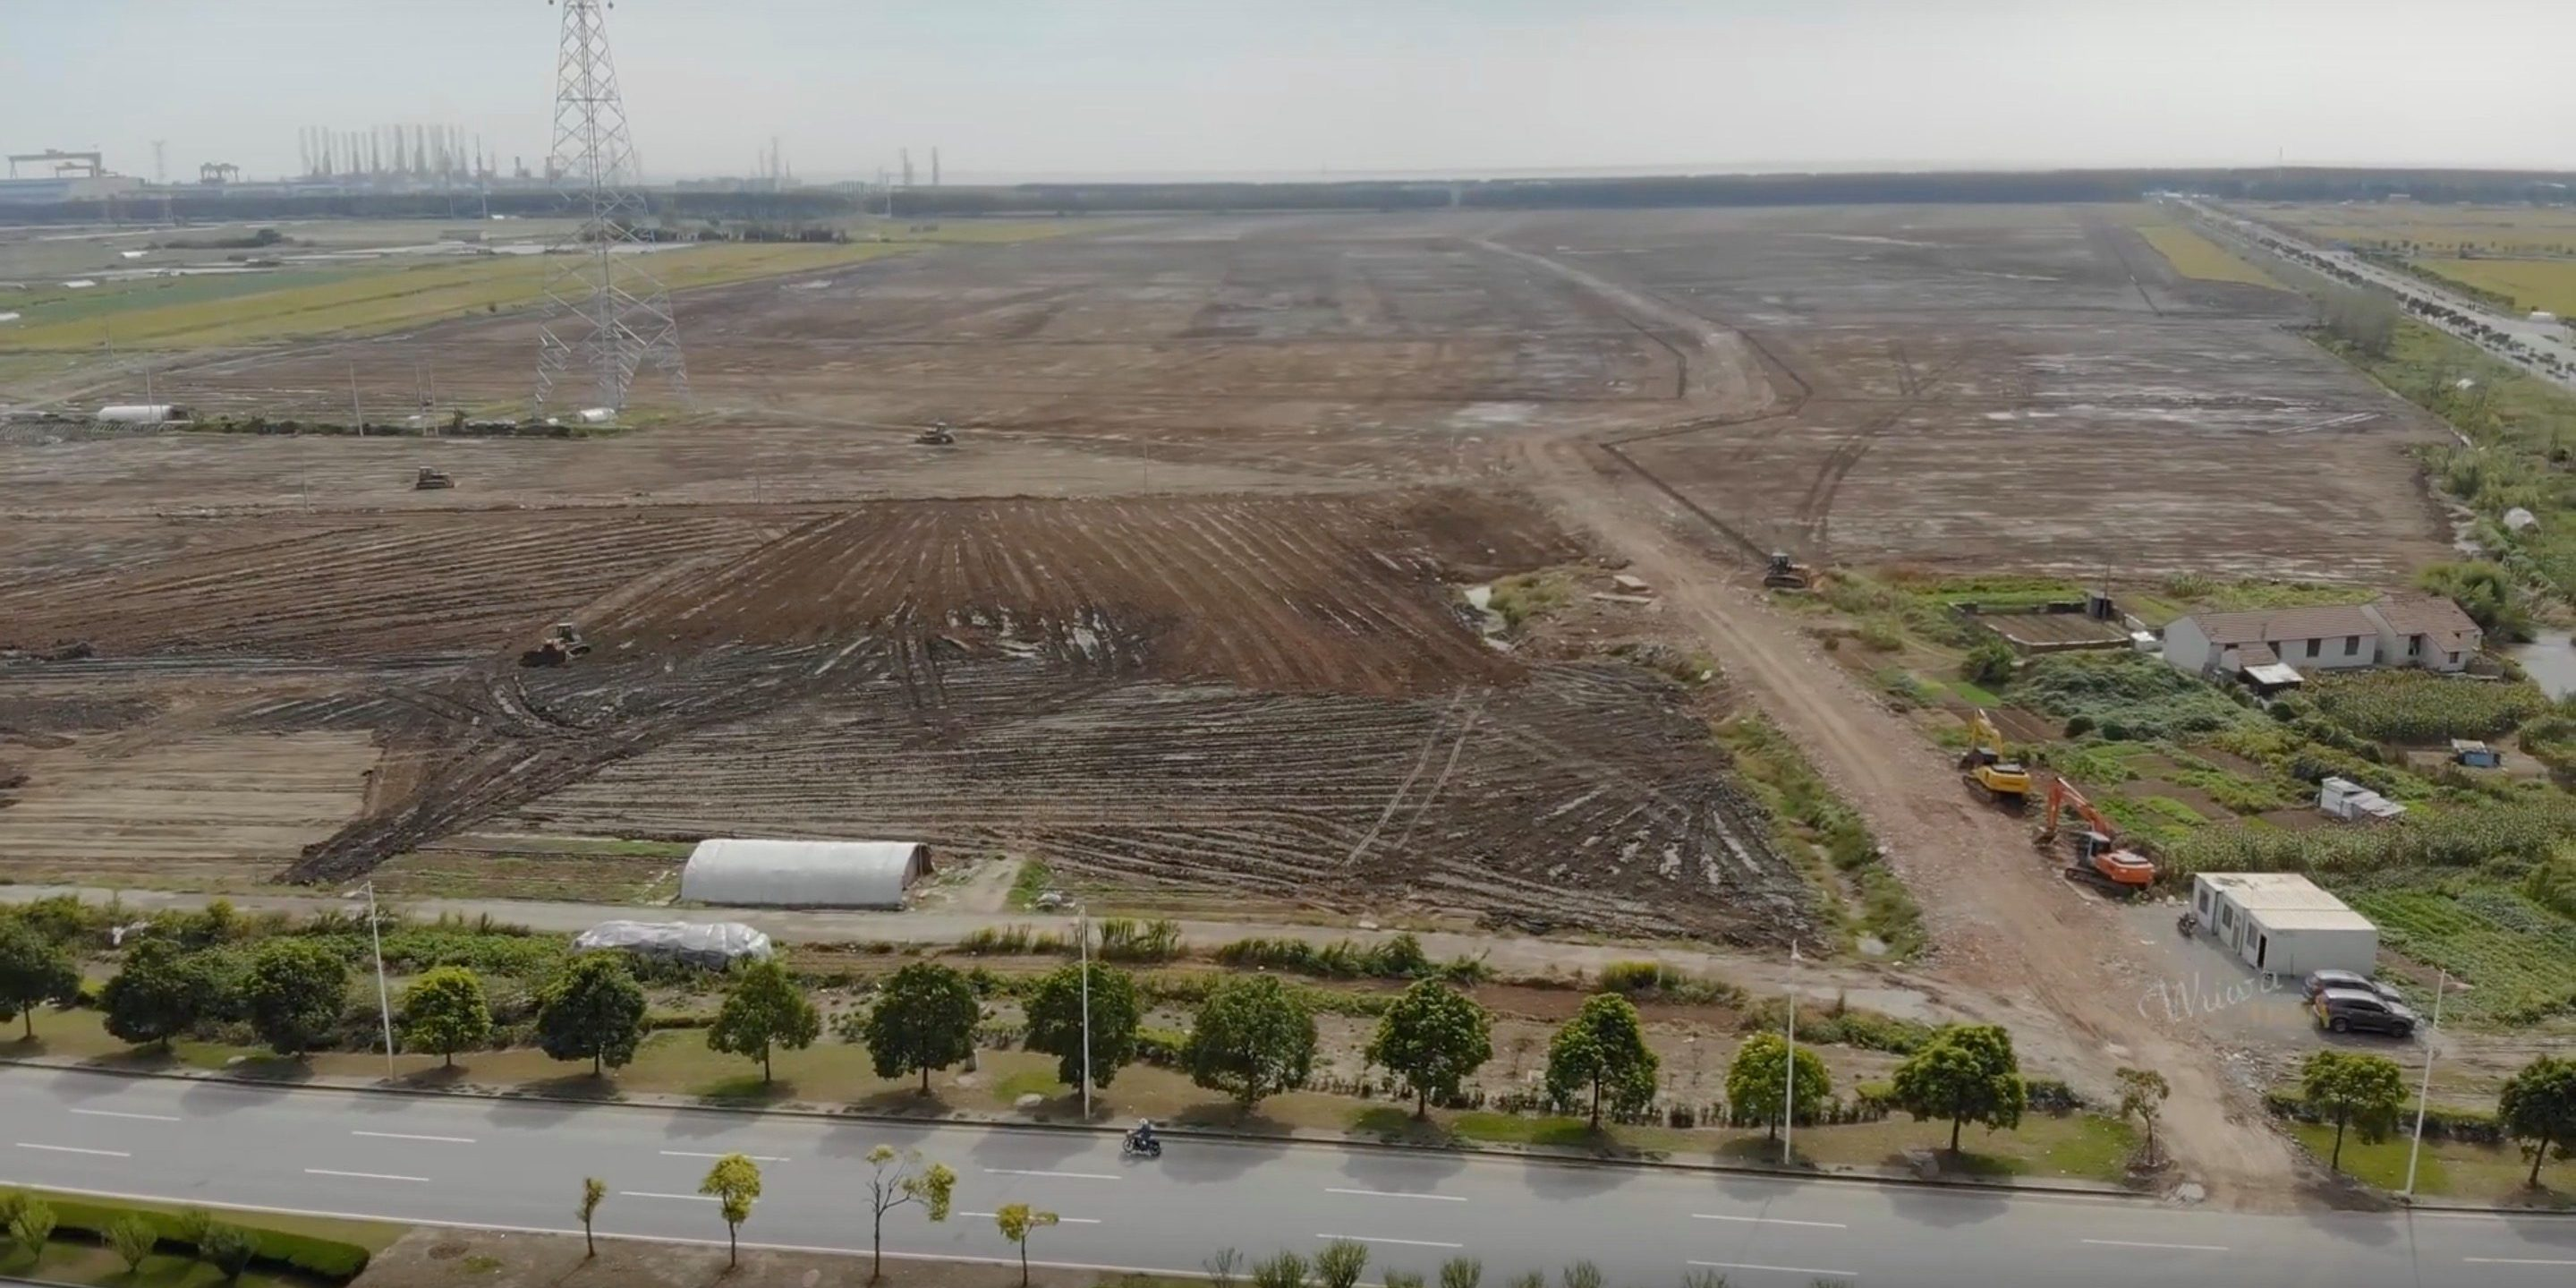 Tesla to start production at Gigafactory 3 within a year, says Shanghai Mayor after Tesla visit